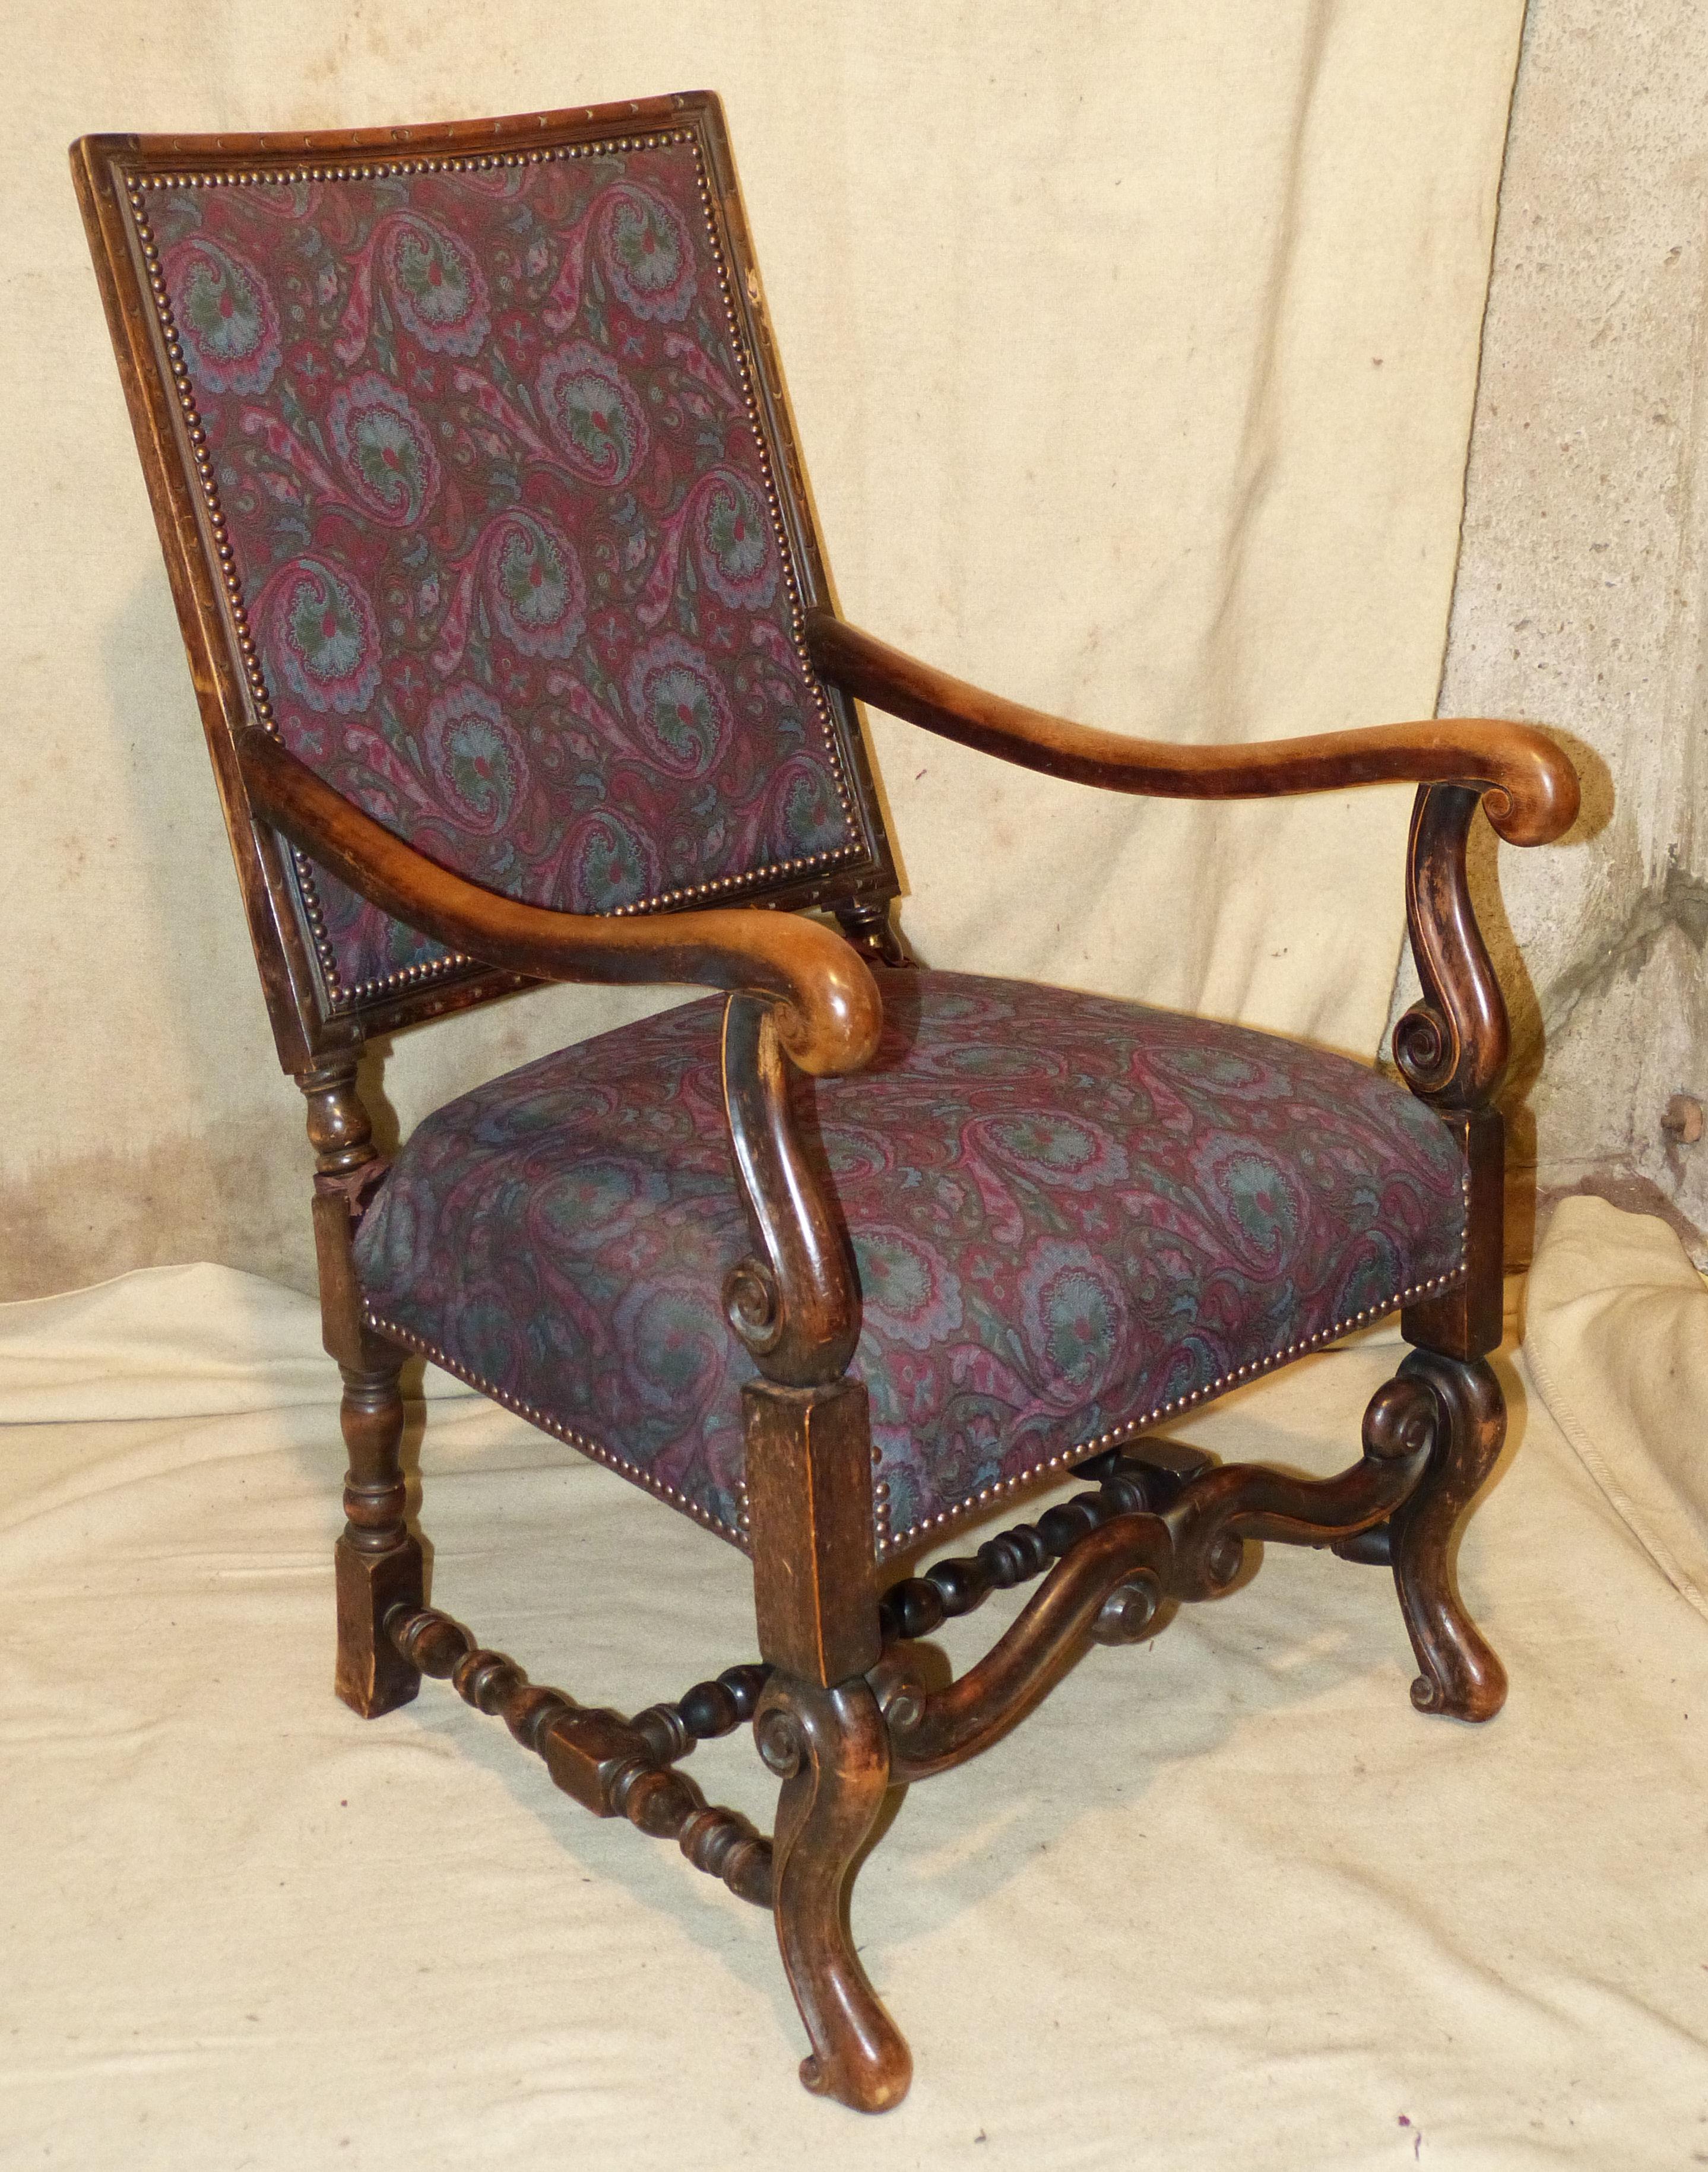 A Walnut Armchair having overstuffed seat and backs